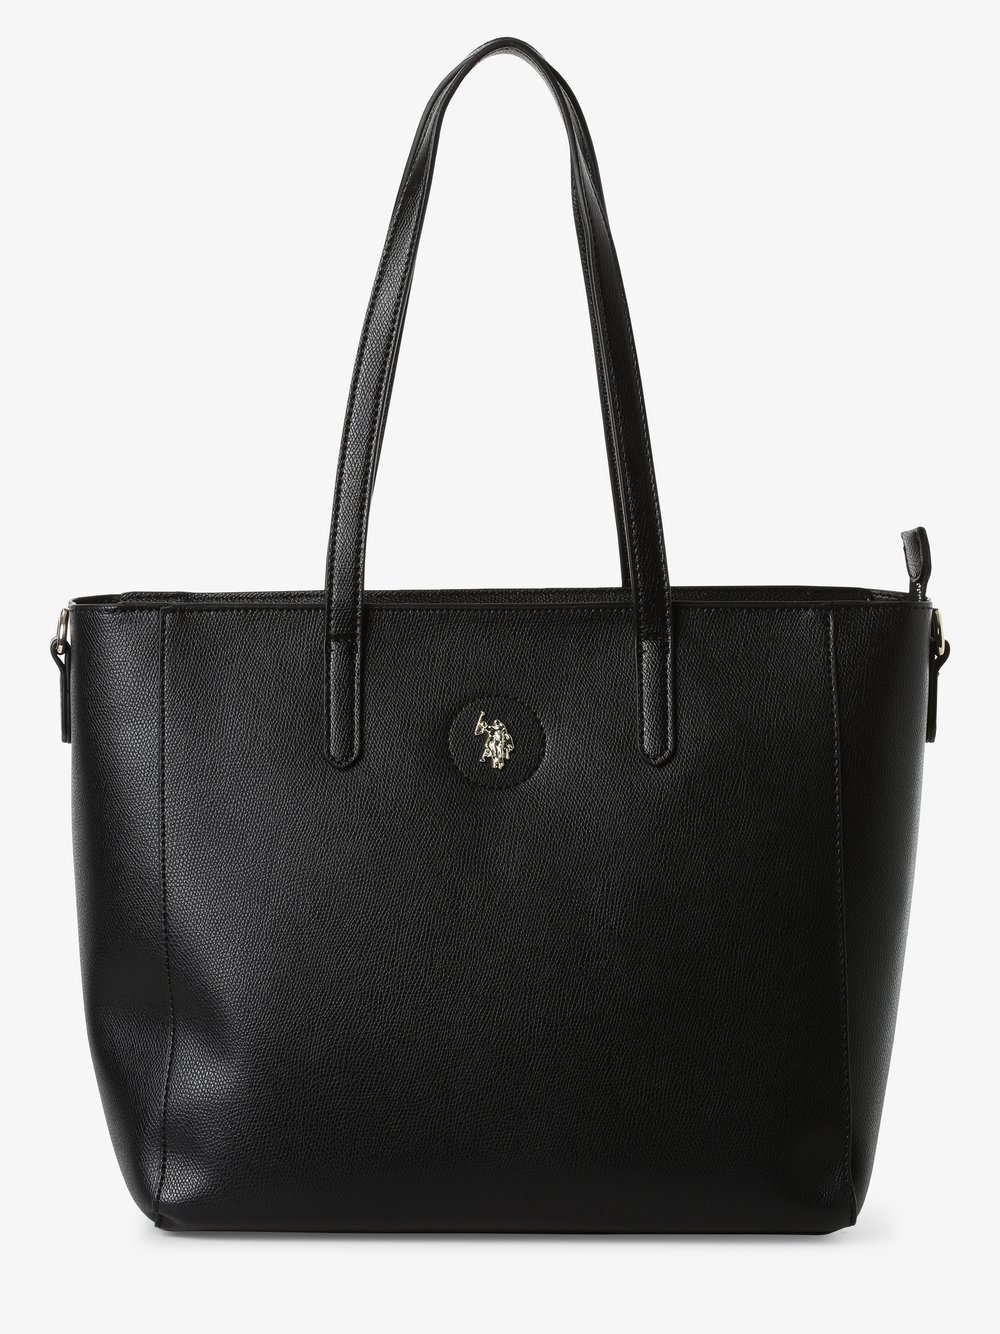 U.S. Polo Assn. – Damska torba shopper, czarny Van Graaf 466418-0001-00000